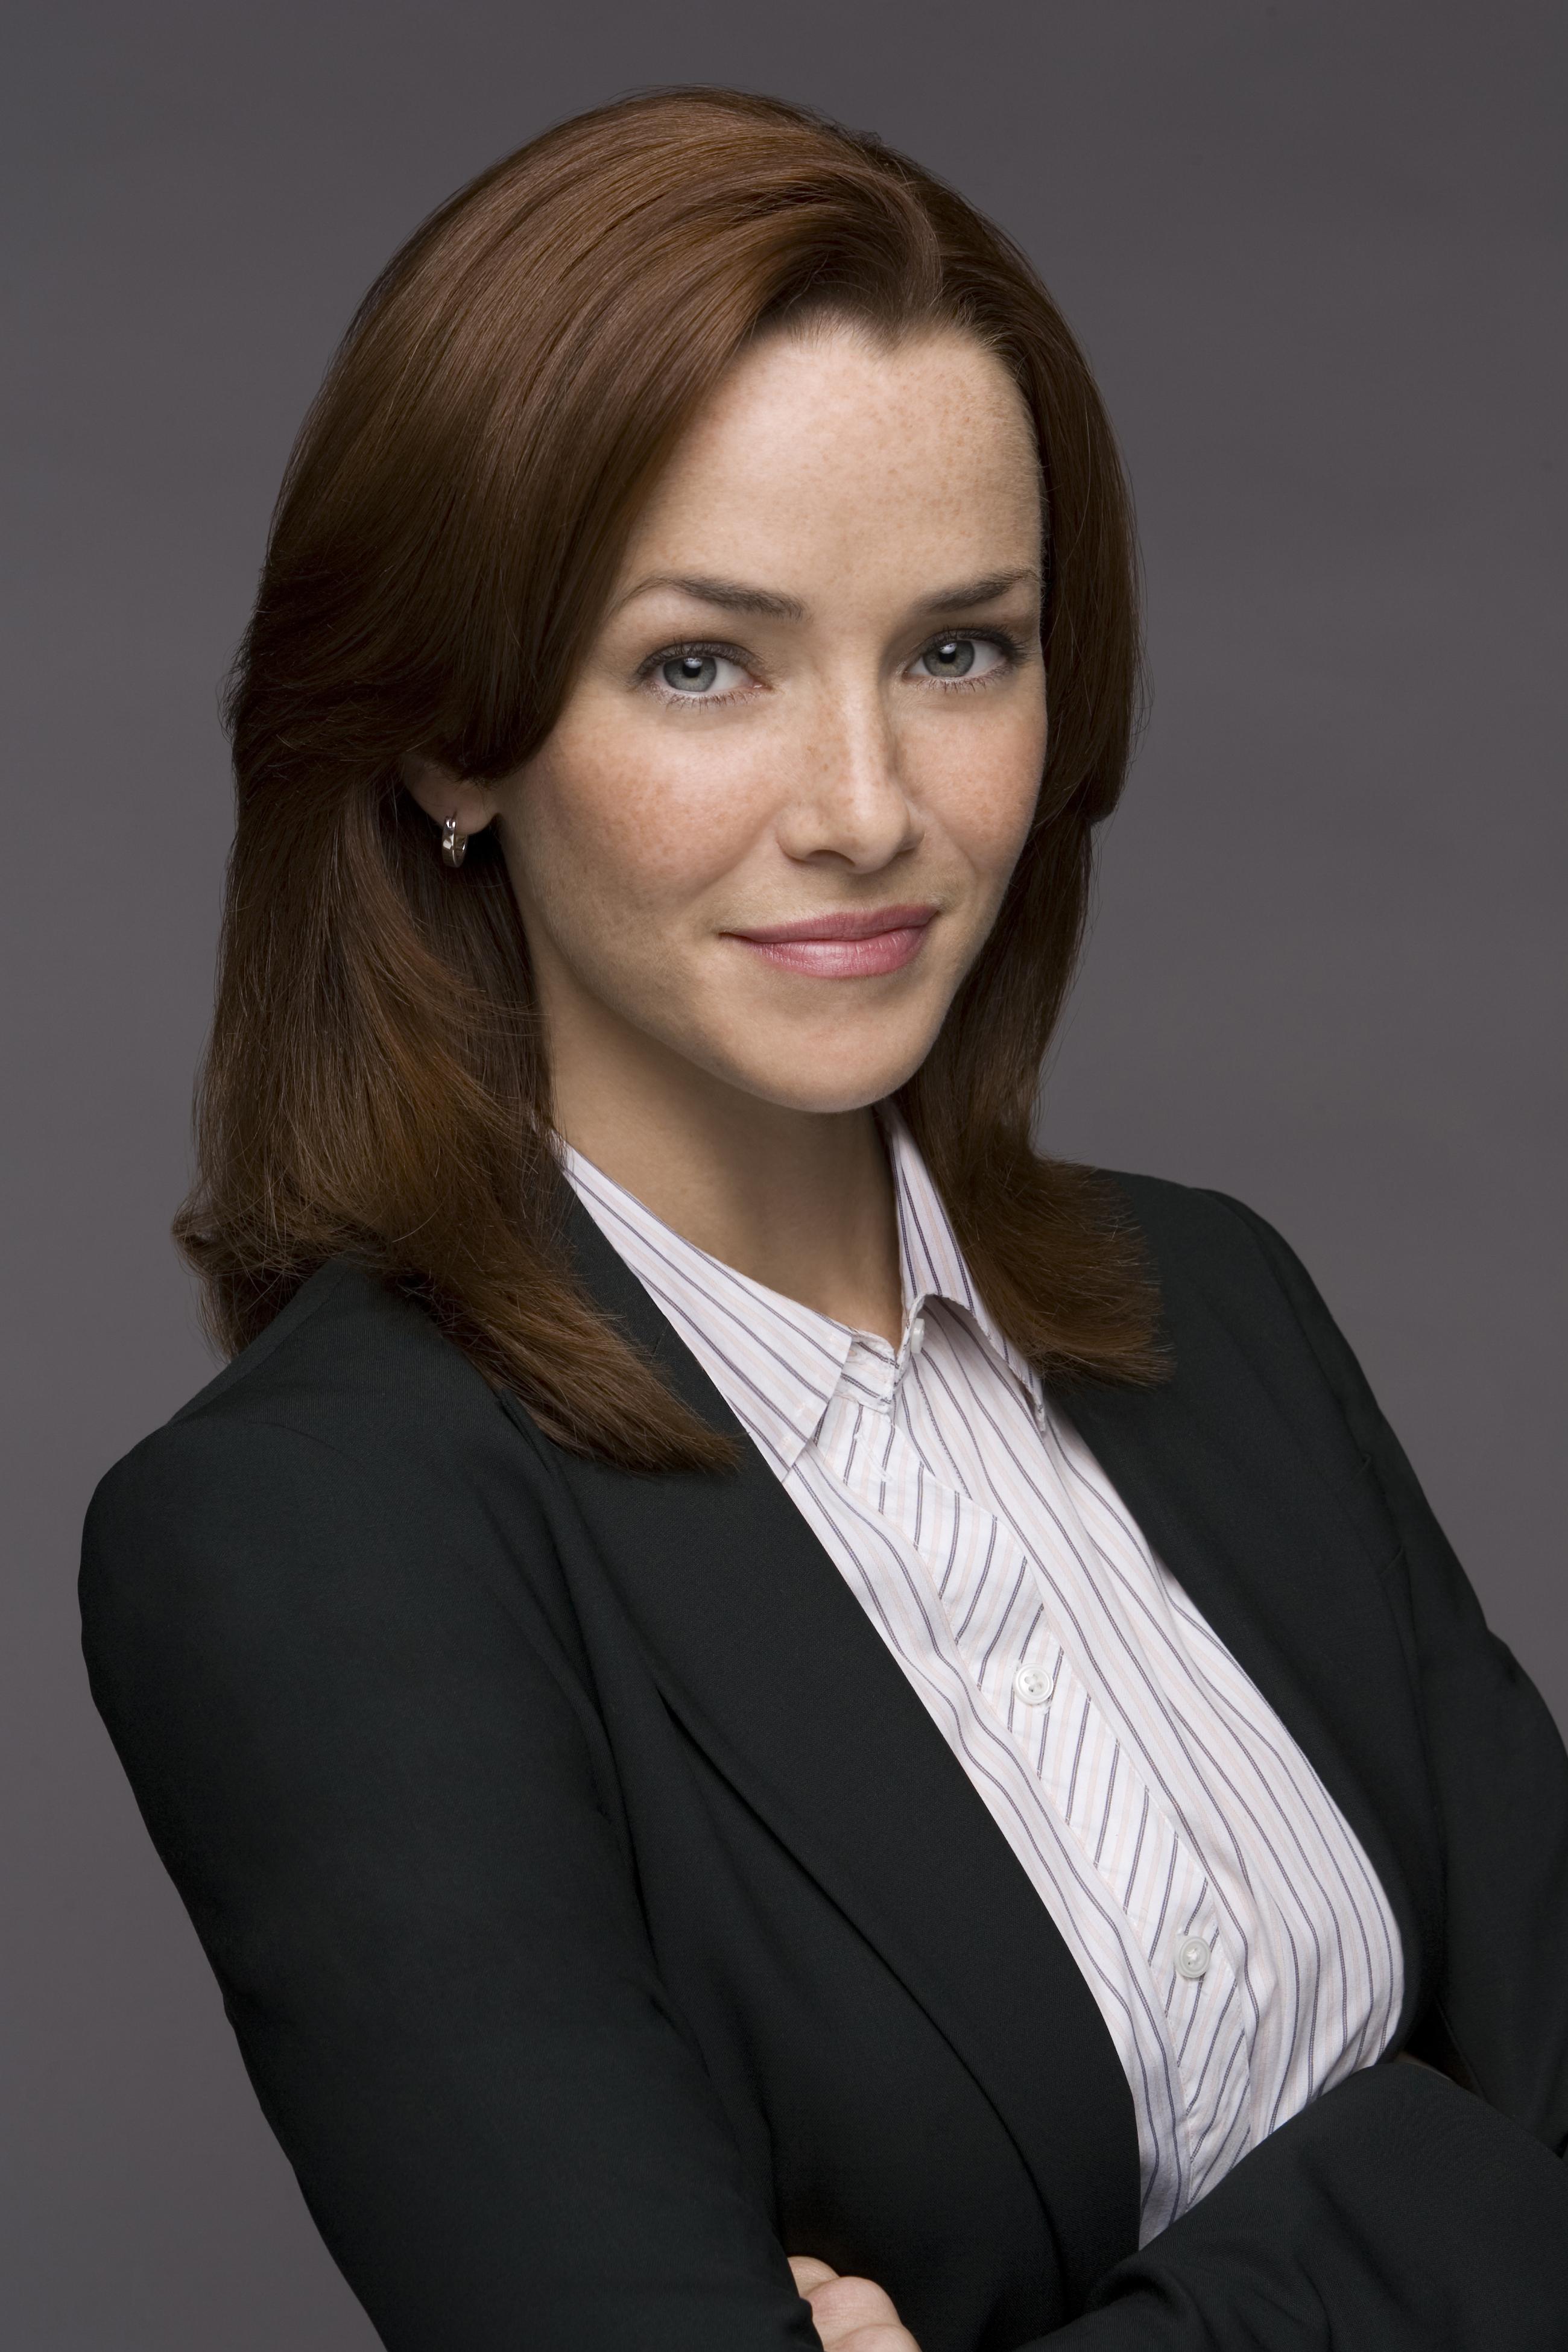 Renee Walker 24 Season 7 promotional photo